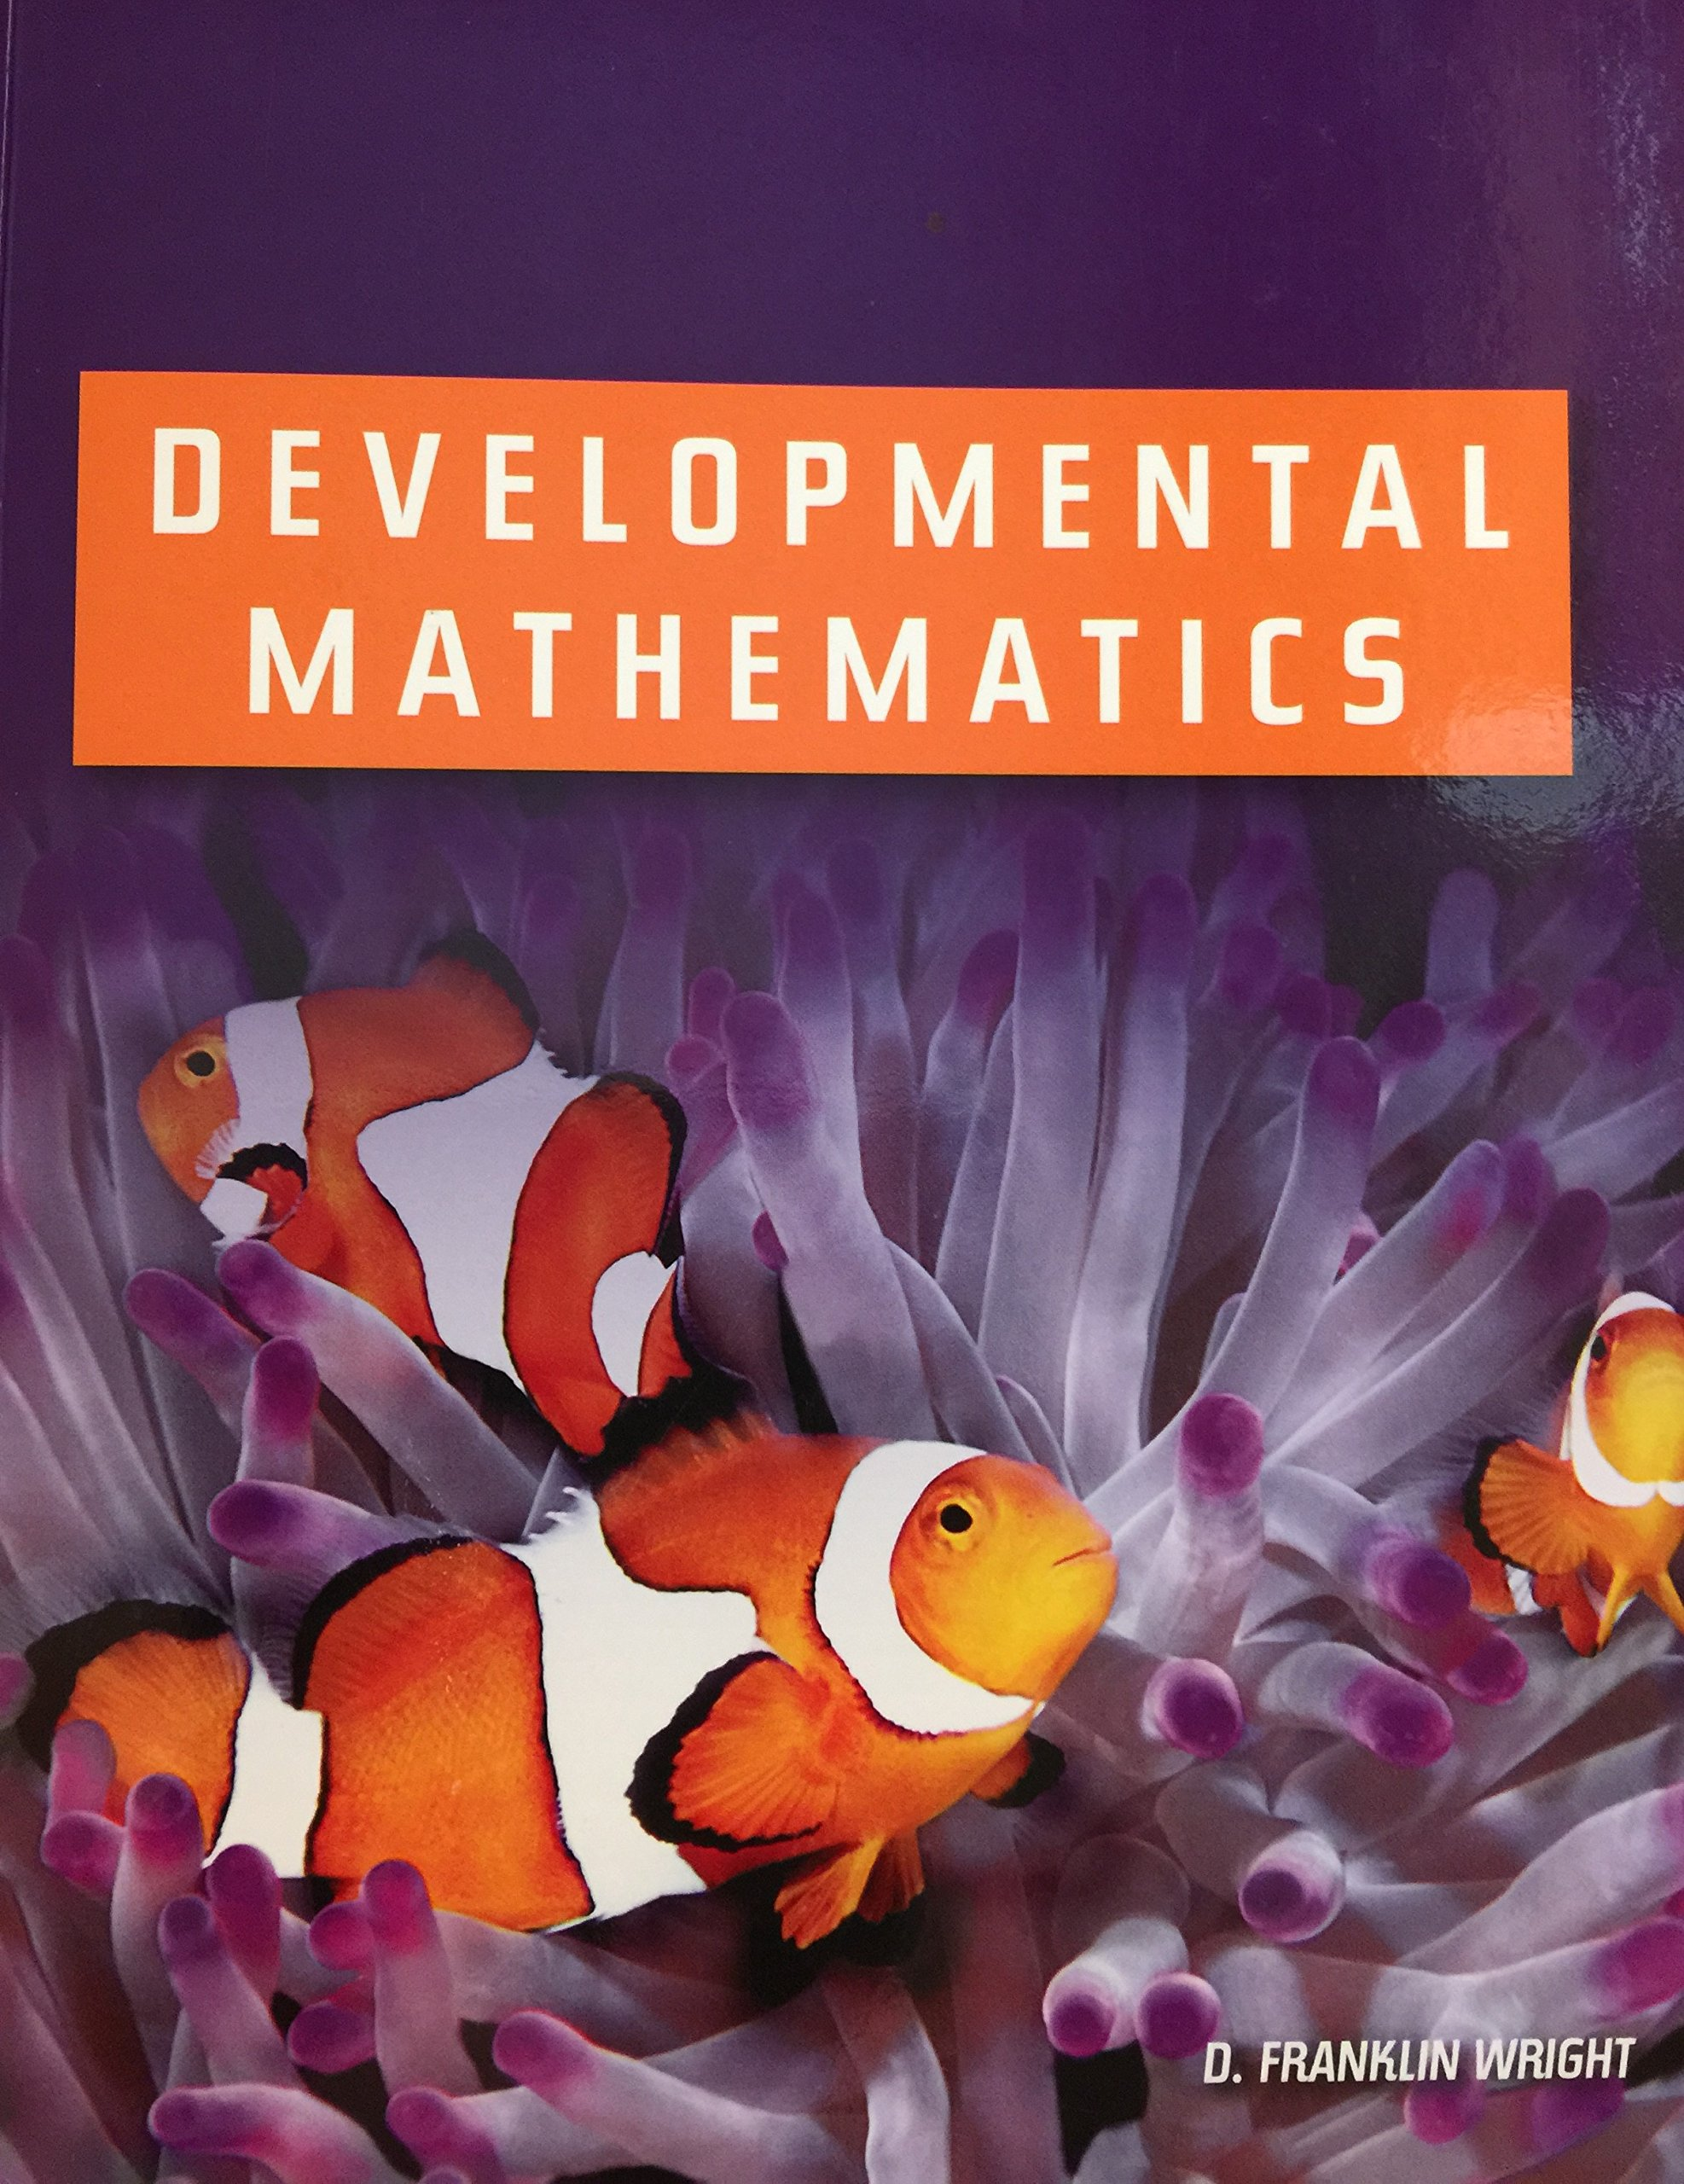 Developmental mathematics textbook author 9781932628838 amazon developmental mathematics textbook author 9781932628838 amazon books fandeluxe Image collections